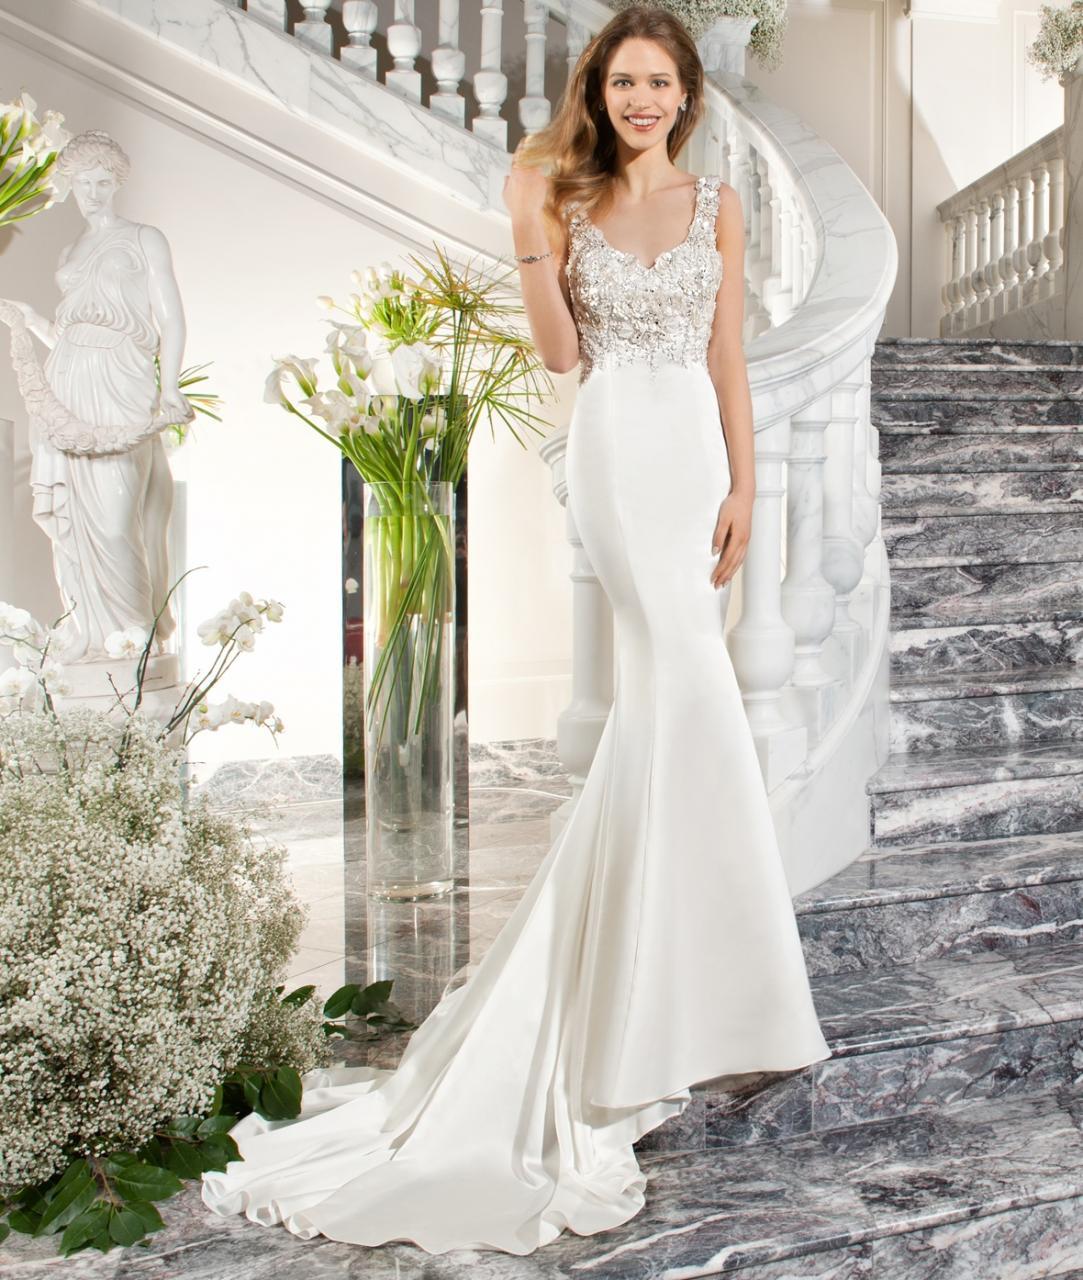 اليك بالصور اخر فساتين ديمتريوس زفاف 2020